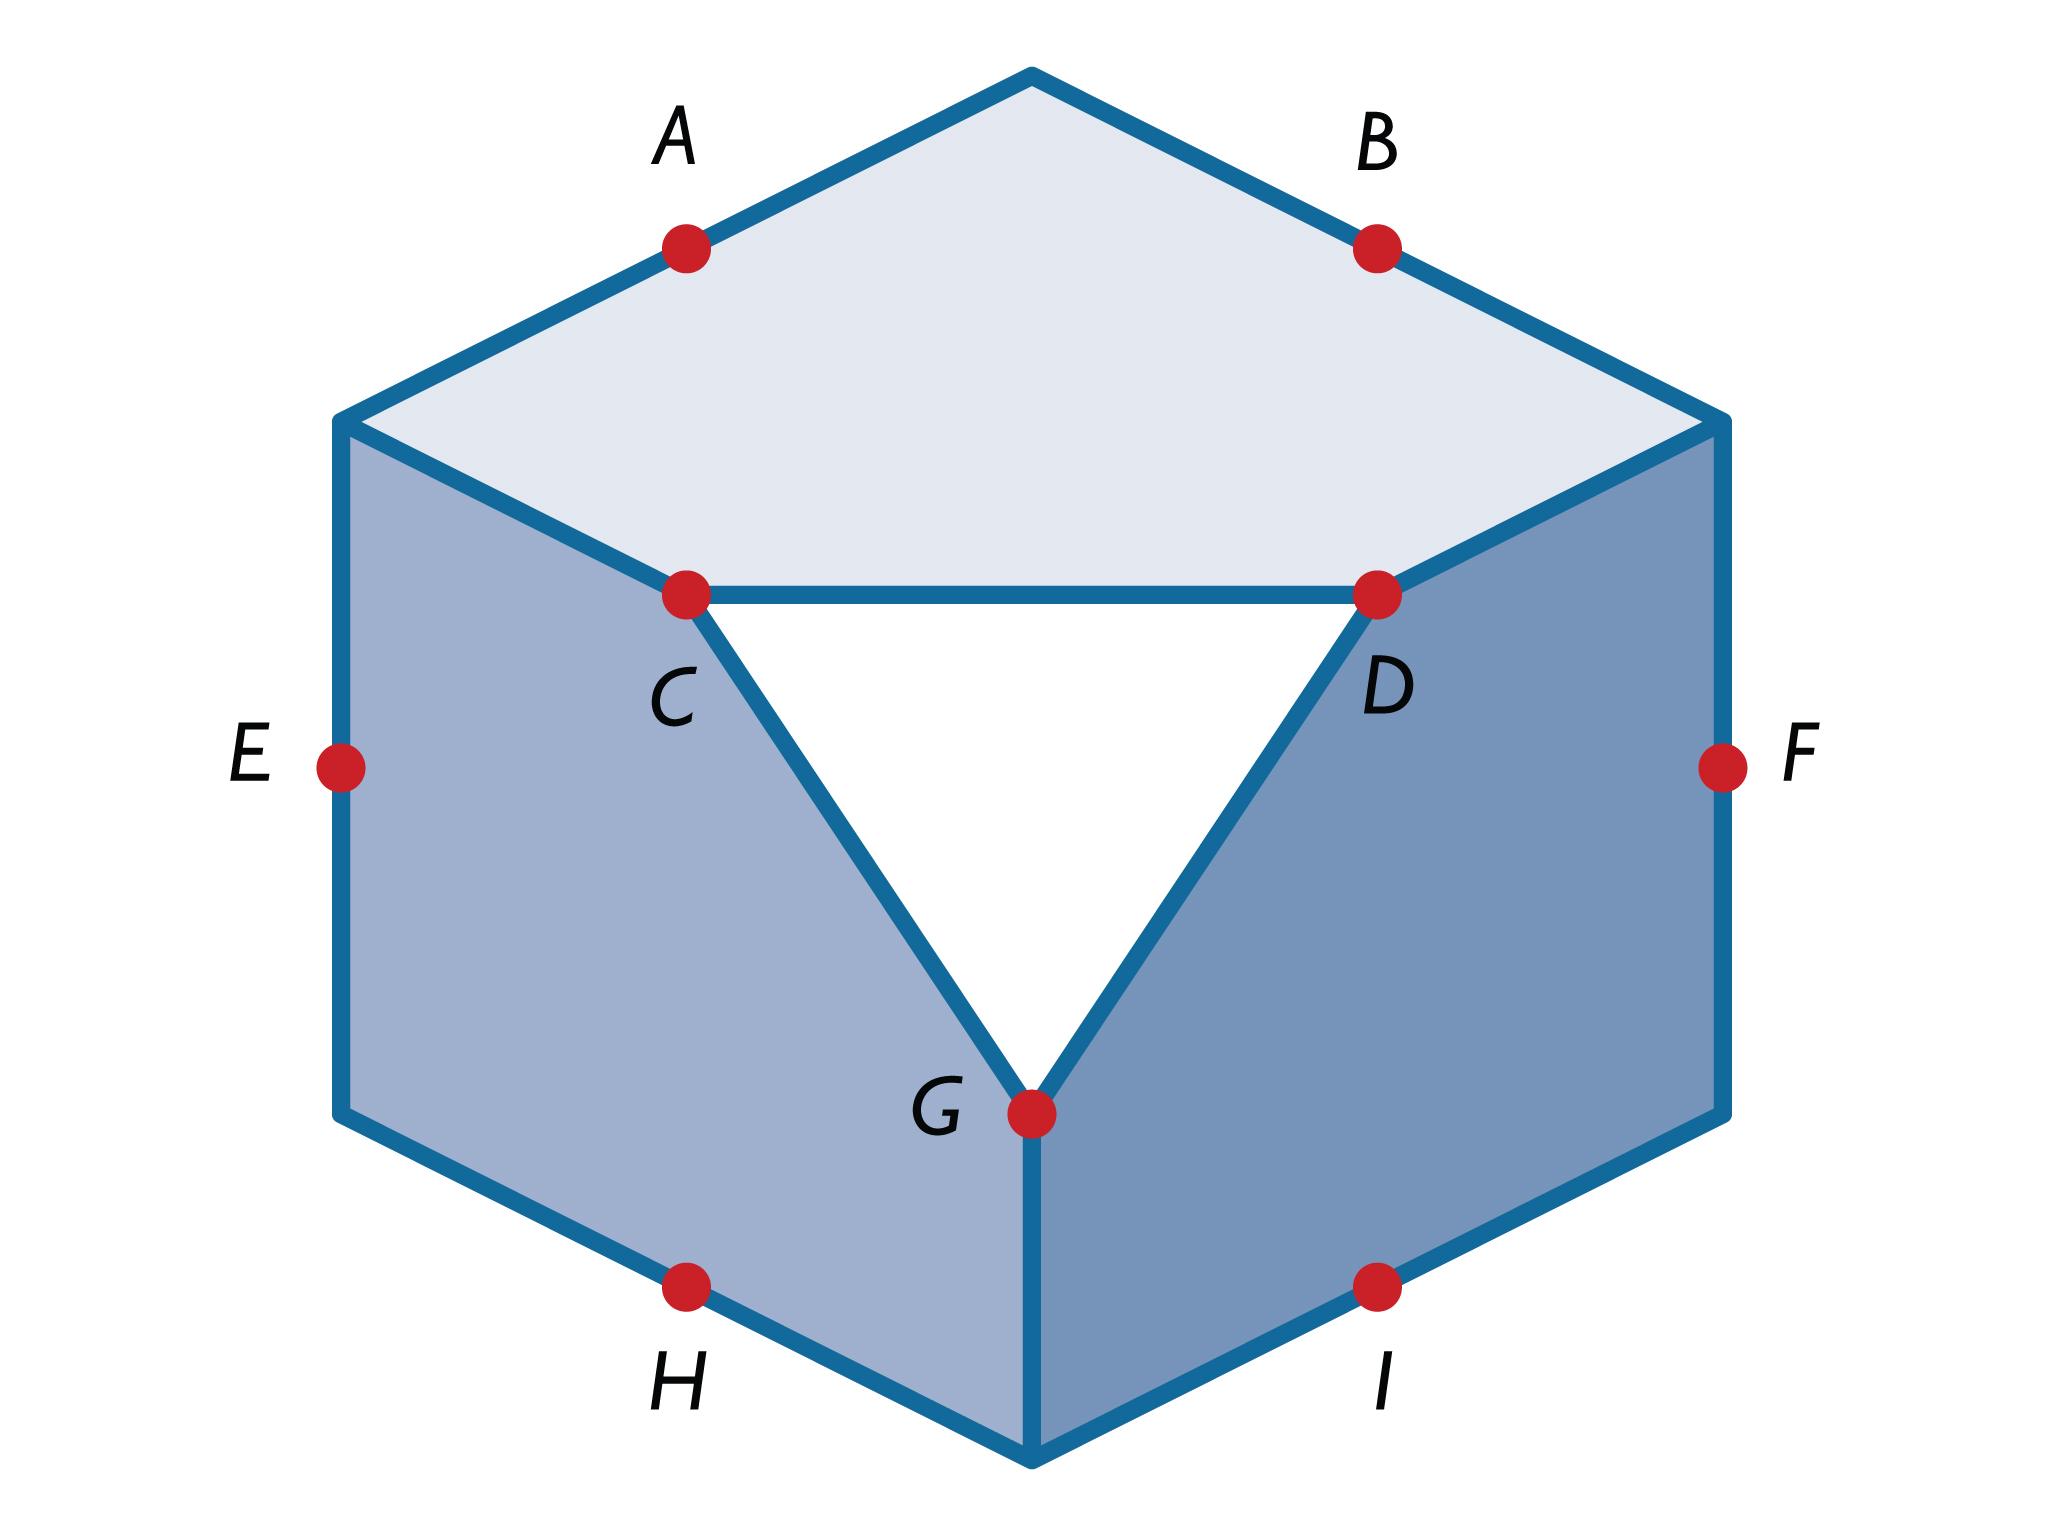 Math Grade 7 Zooming In On Figures Exploring Cross